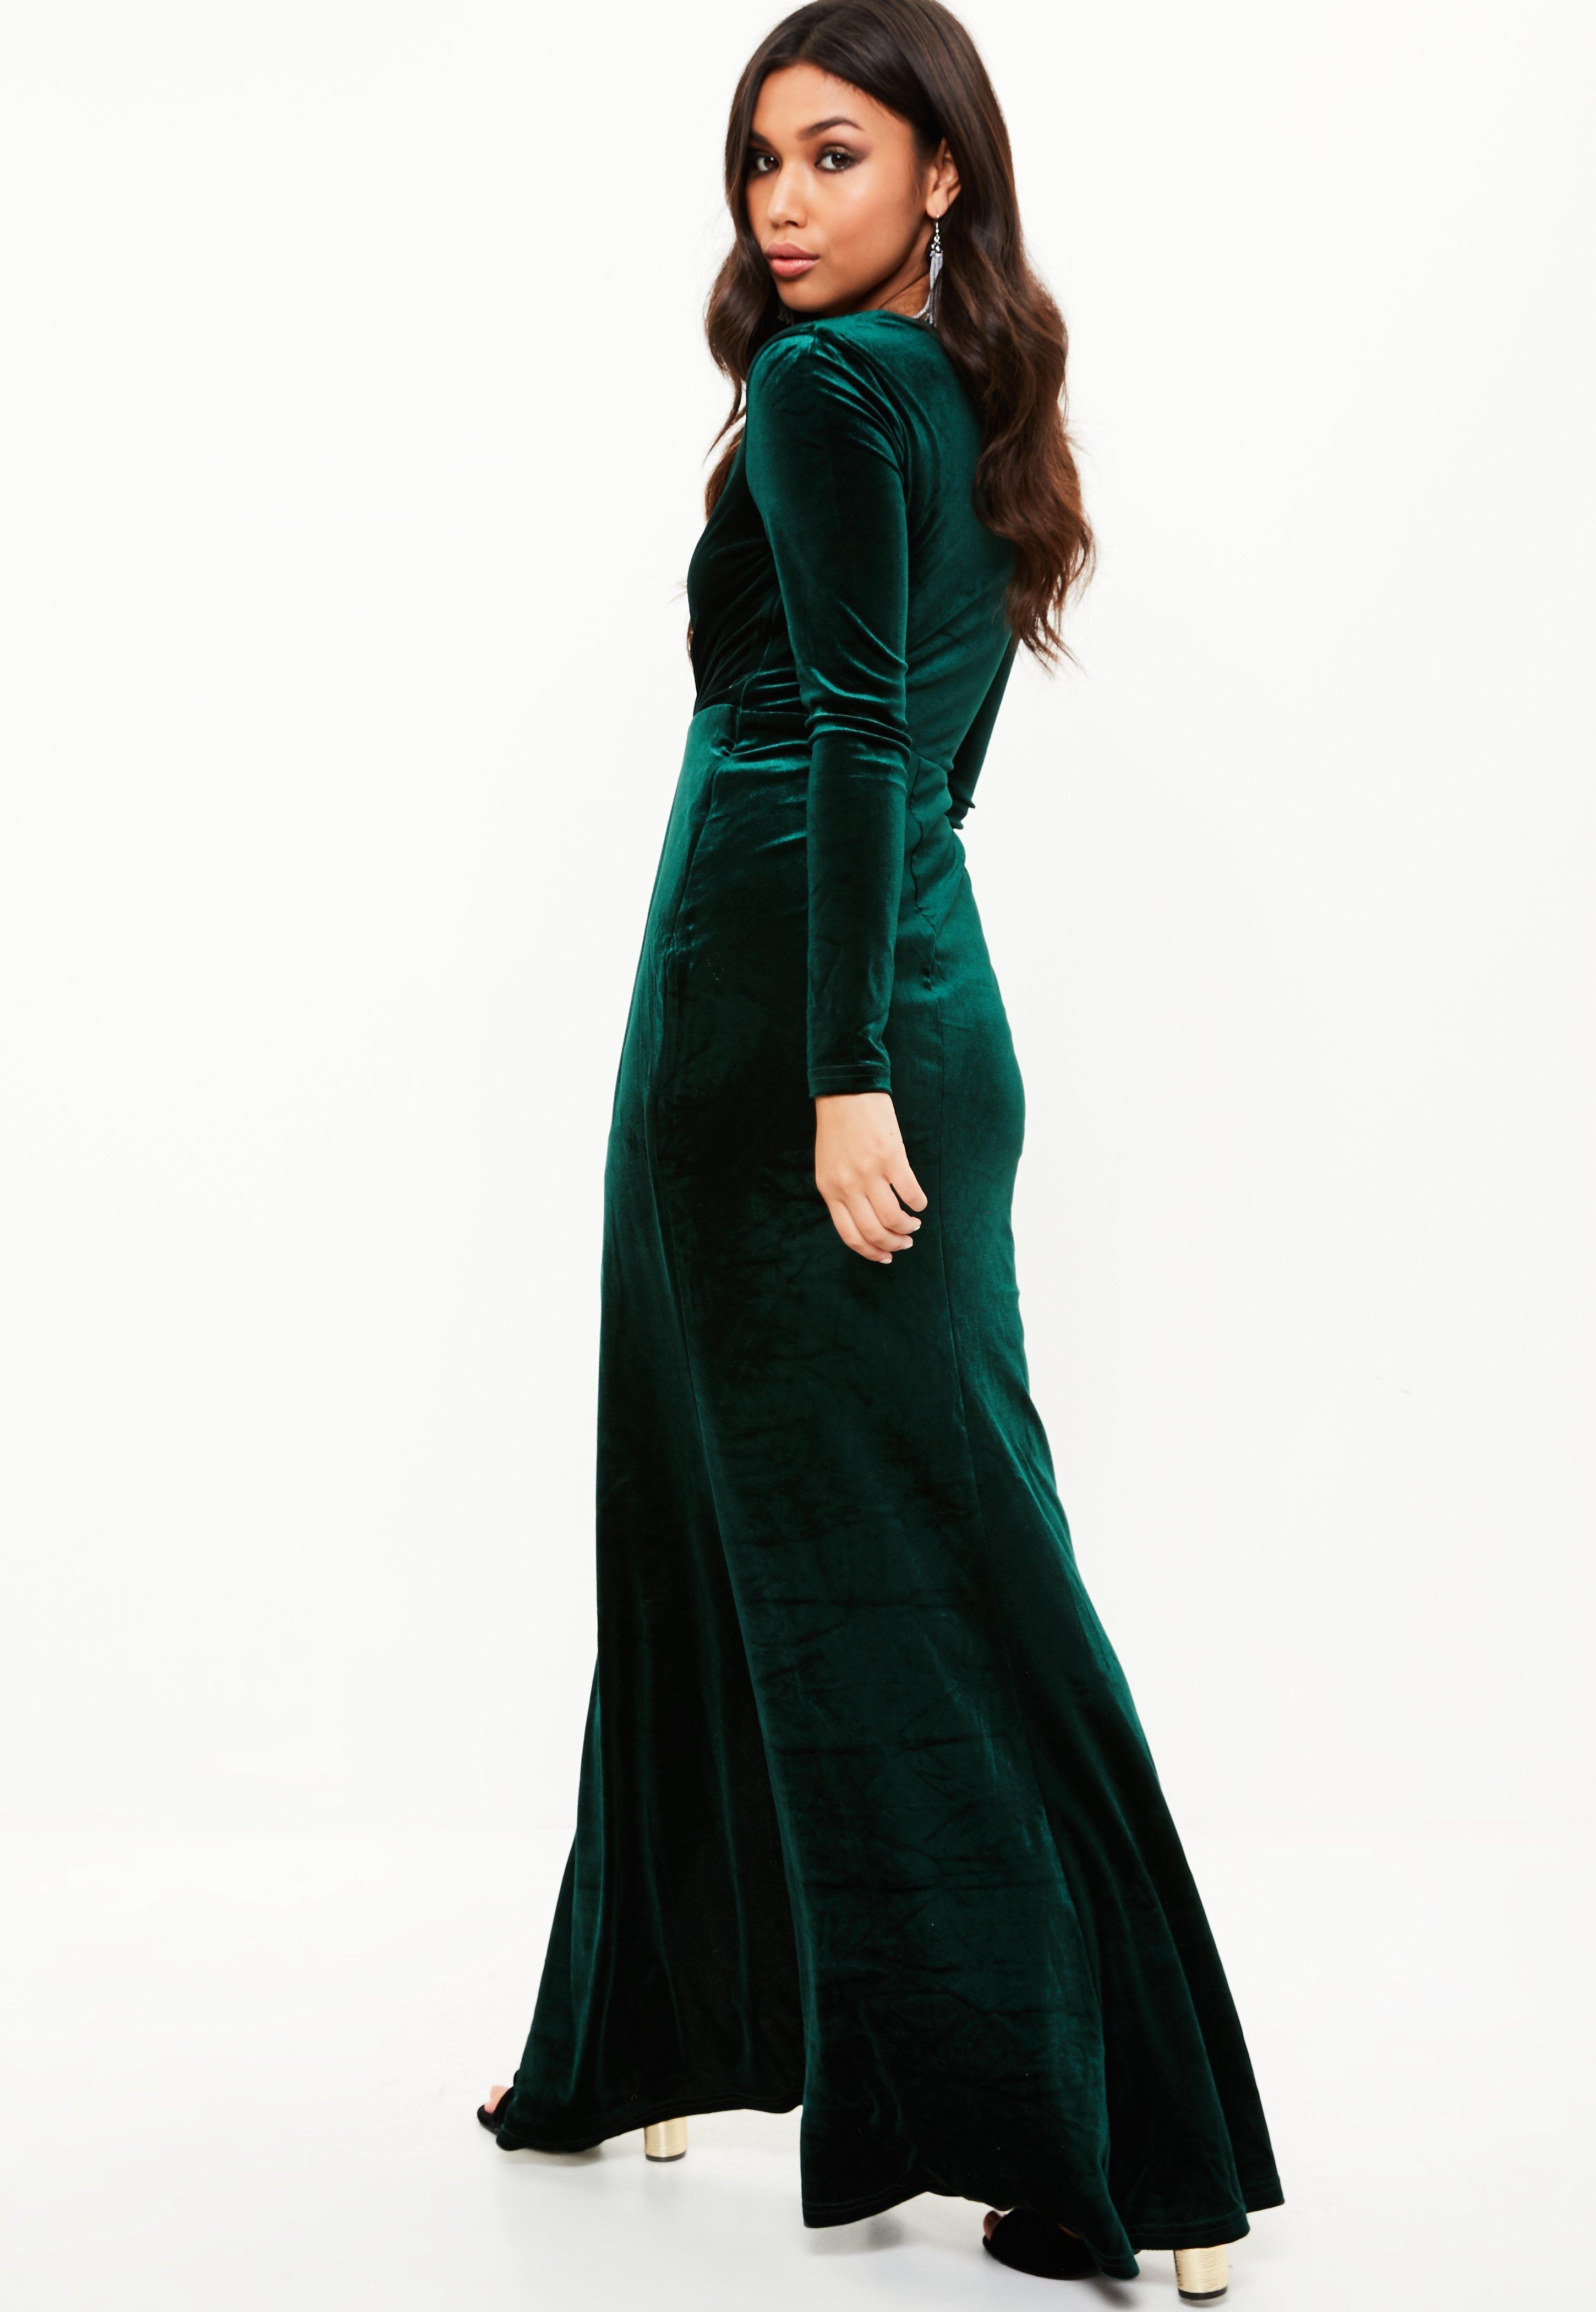 531d5f28cc Lyst - Missguided Green Velvet Plunge Long Sleeve Maxi Dress in Green